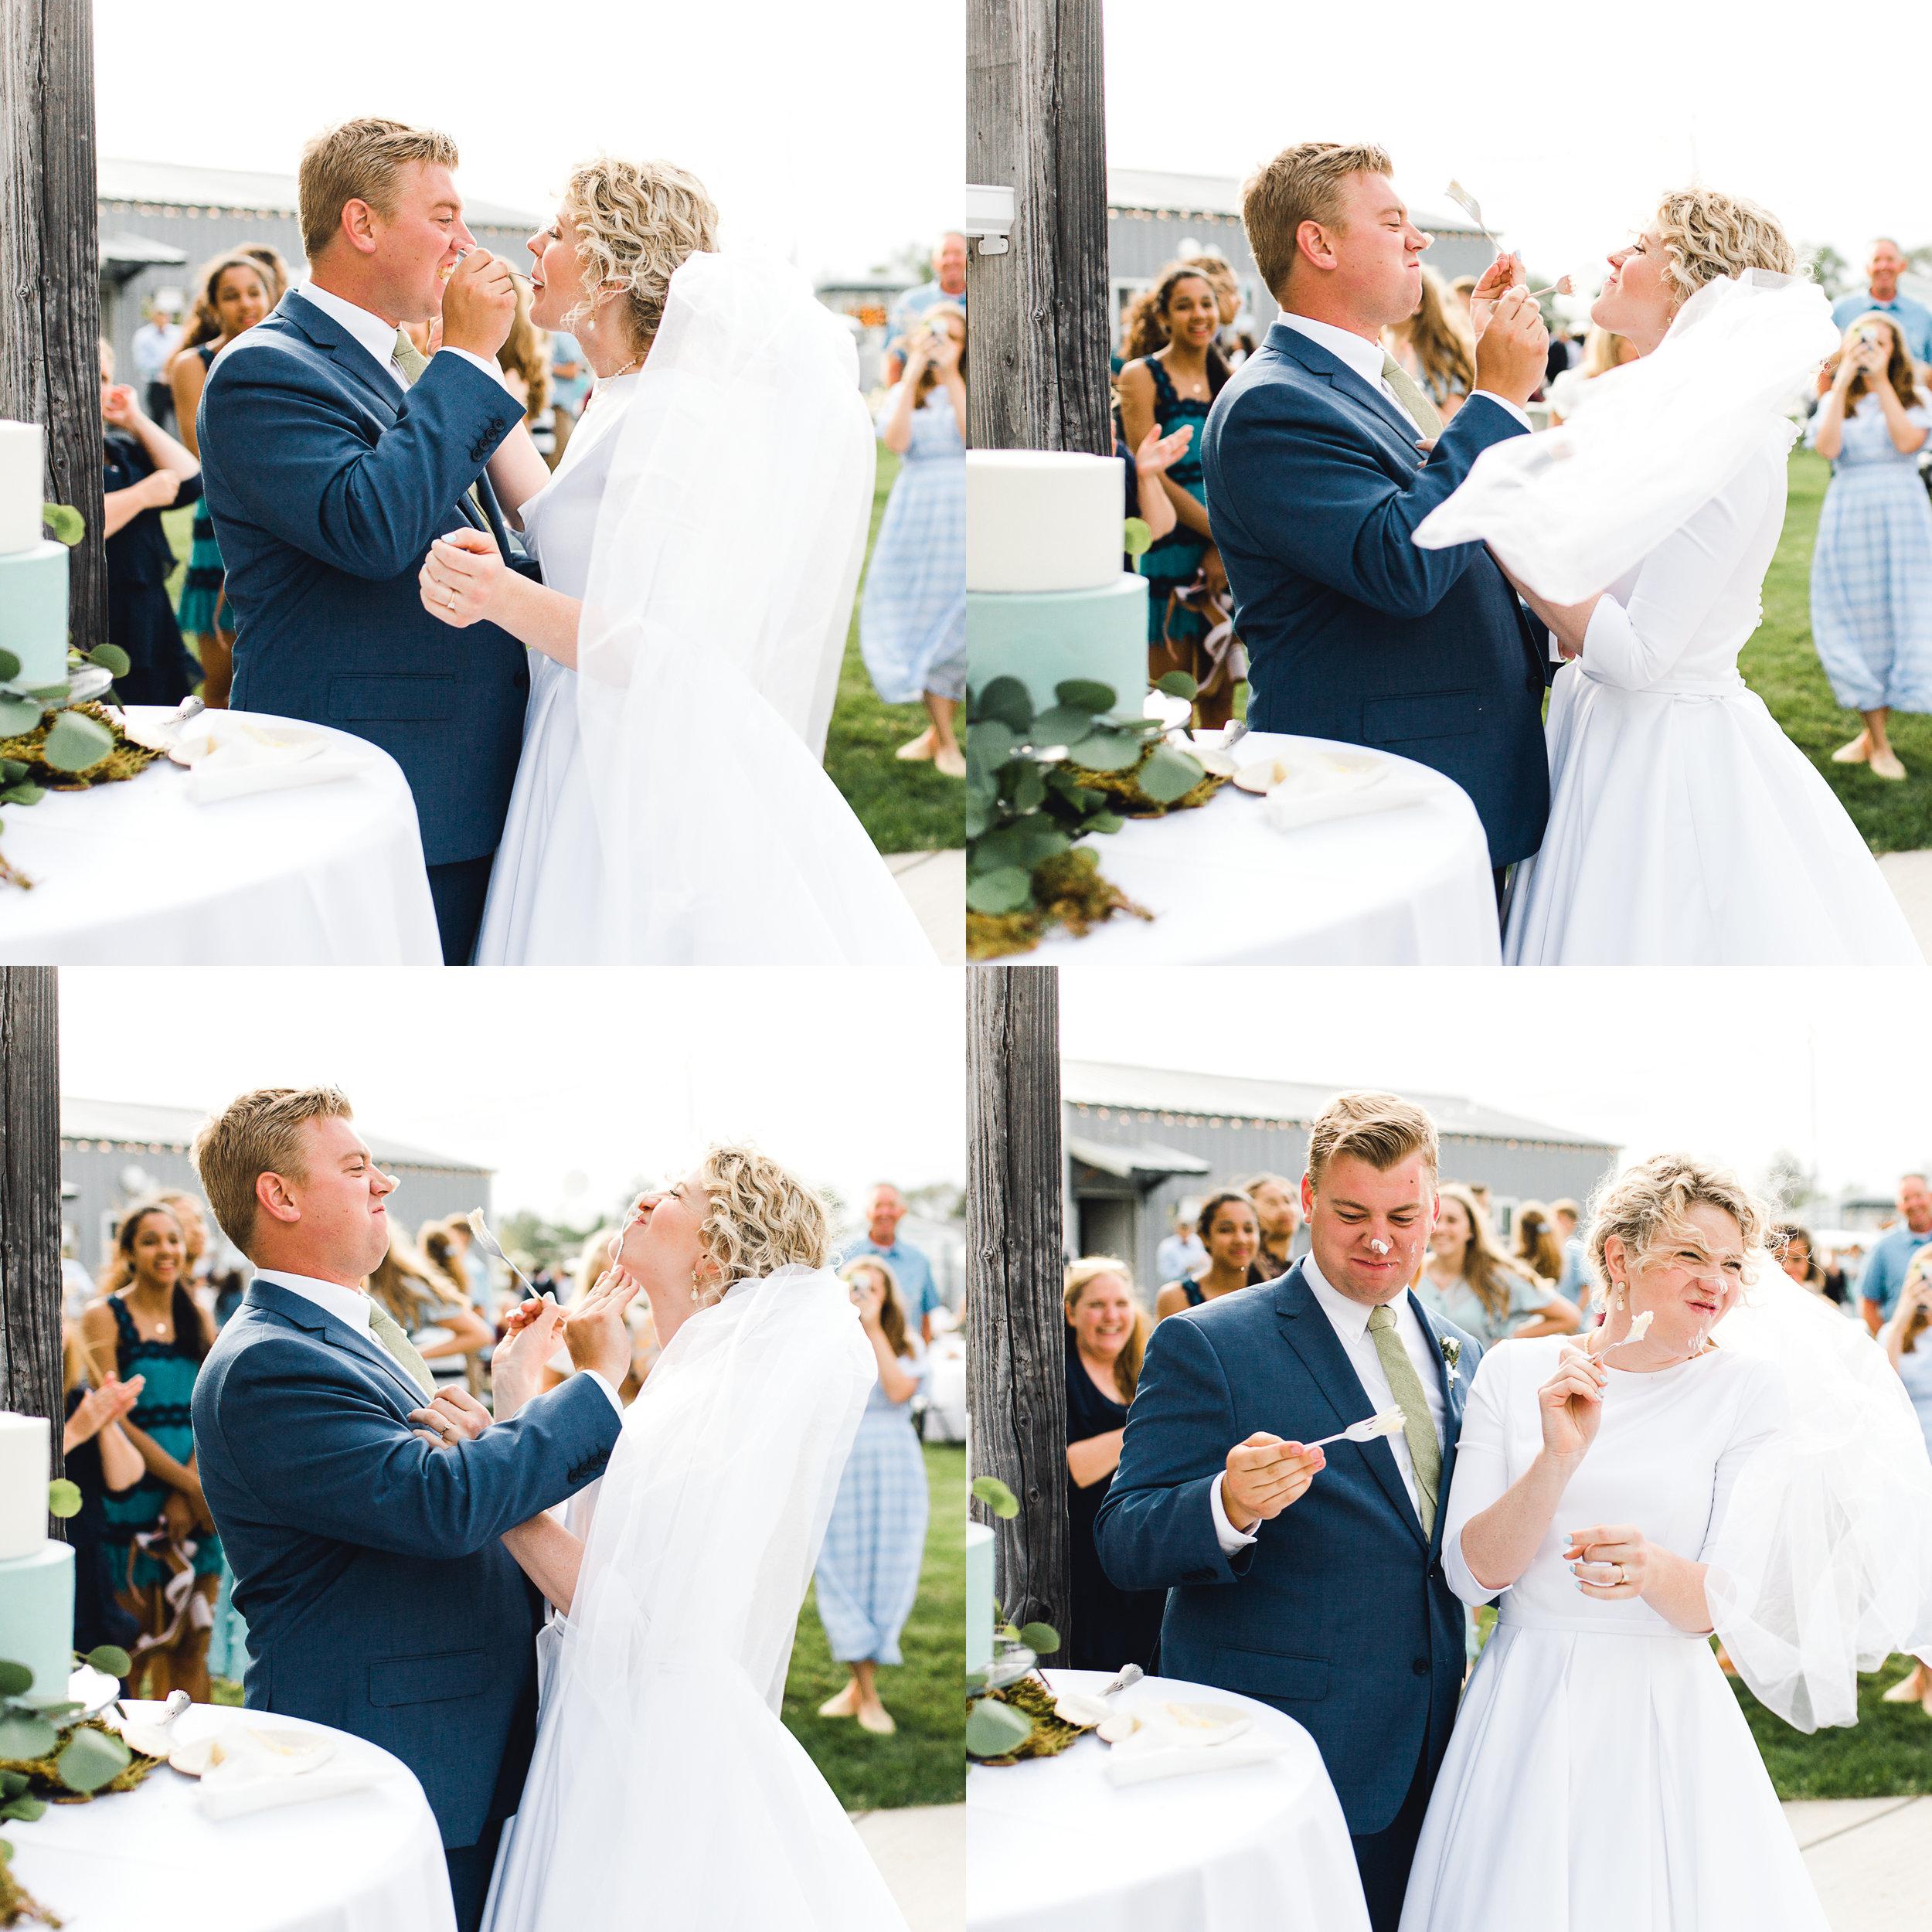 beautiful-outdoor-backyard-wedding-reception-anna-christine-photography-rexburg-idaho-8.jpg